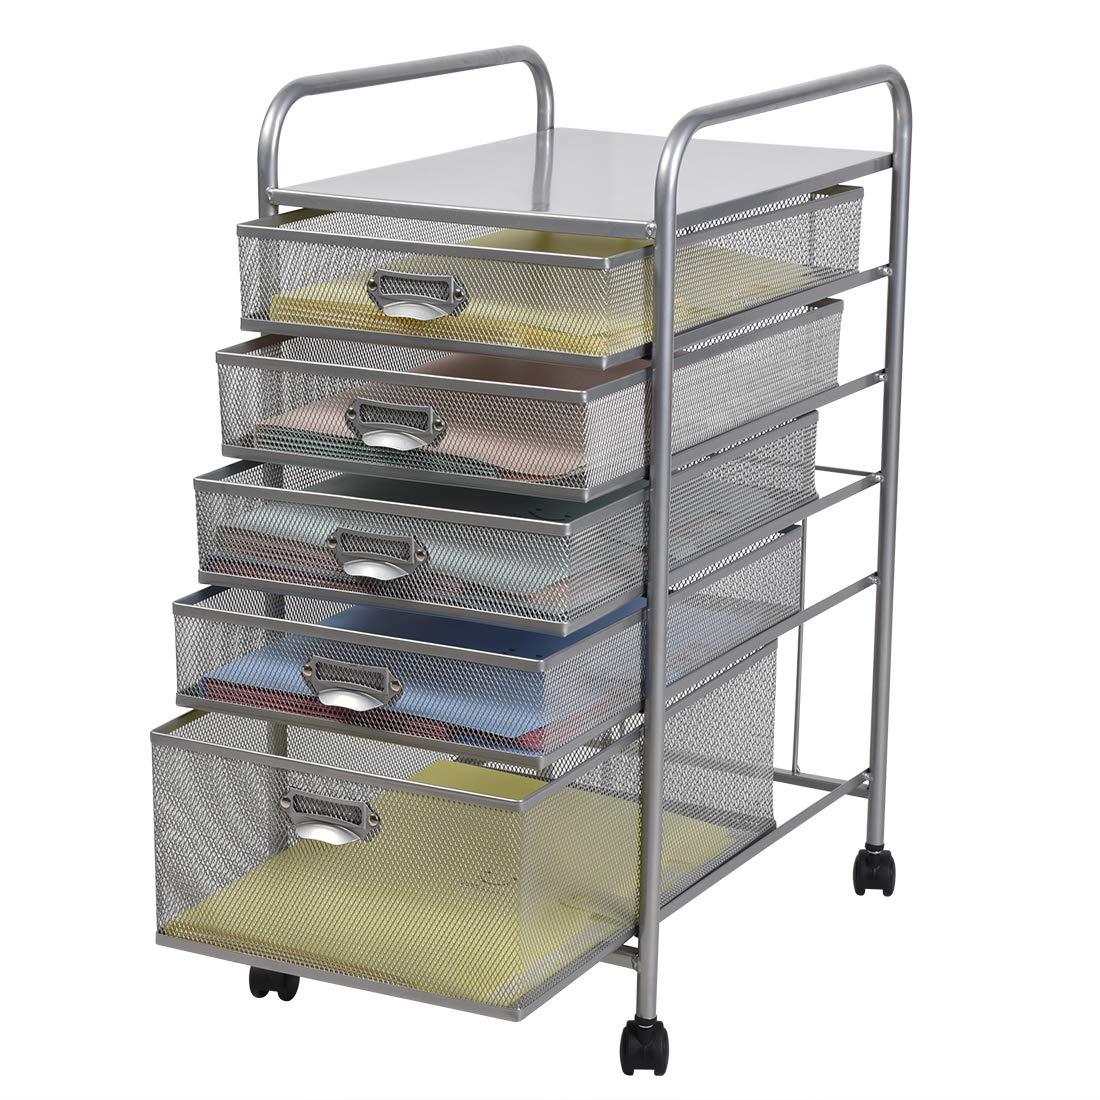 100% Metal Mesh 5 Drawer Rolling Cart Storage Organizer File Basket Cart Office&Home Cabinet-Silver